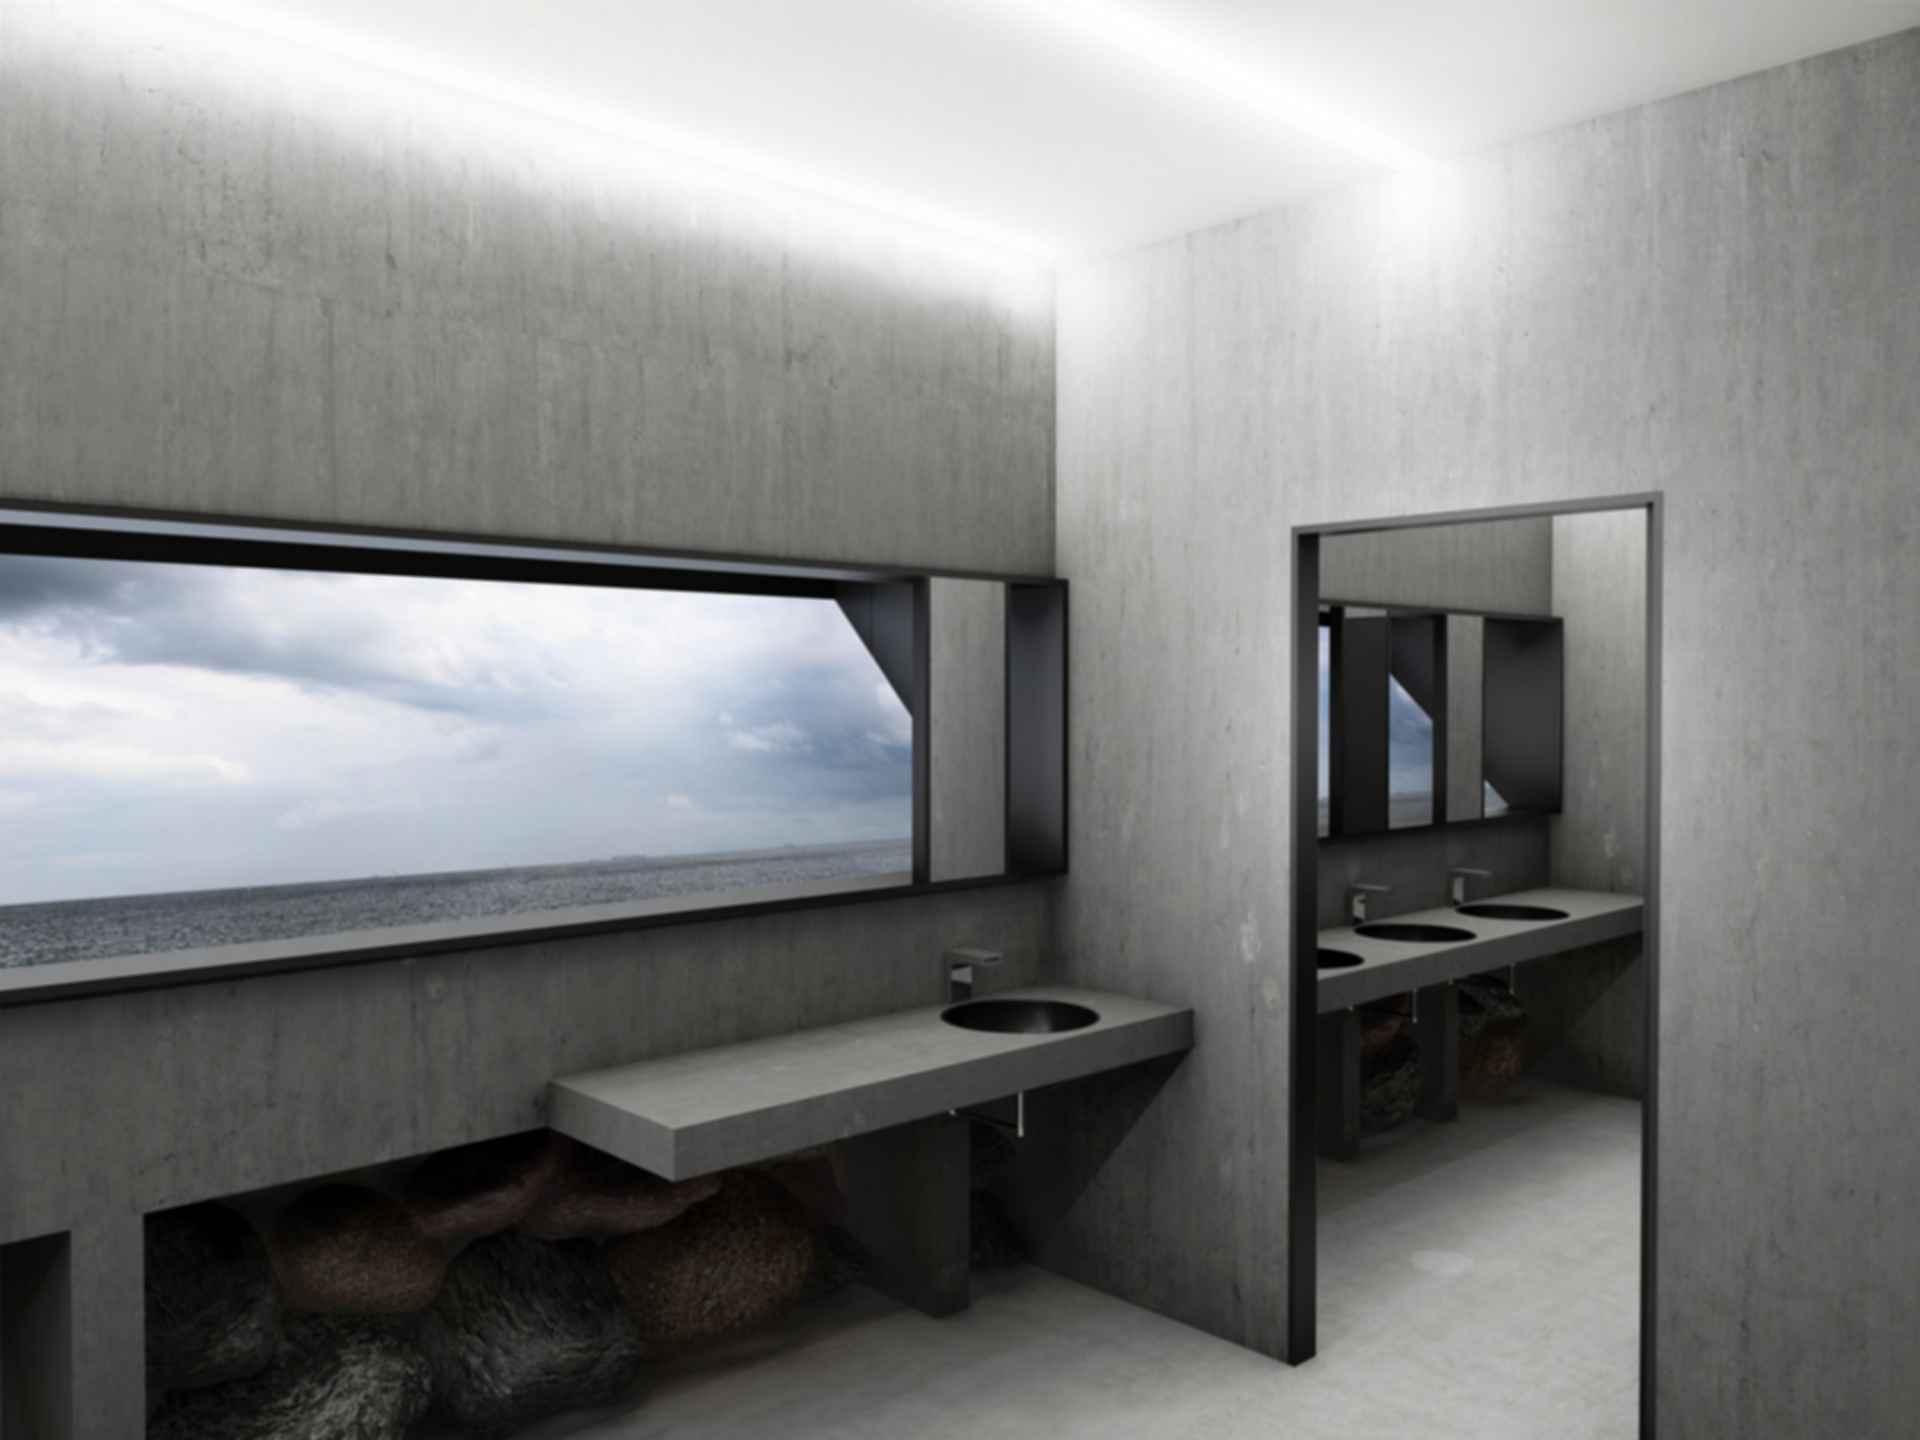 Seaside Periscope - Concept Design